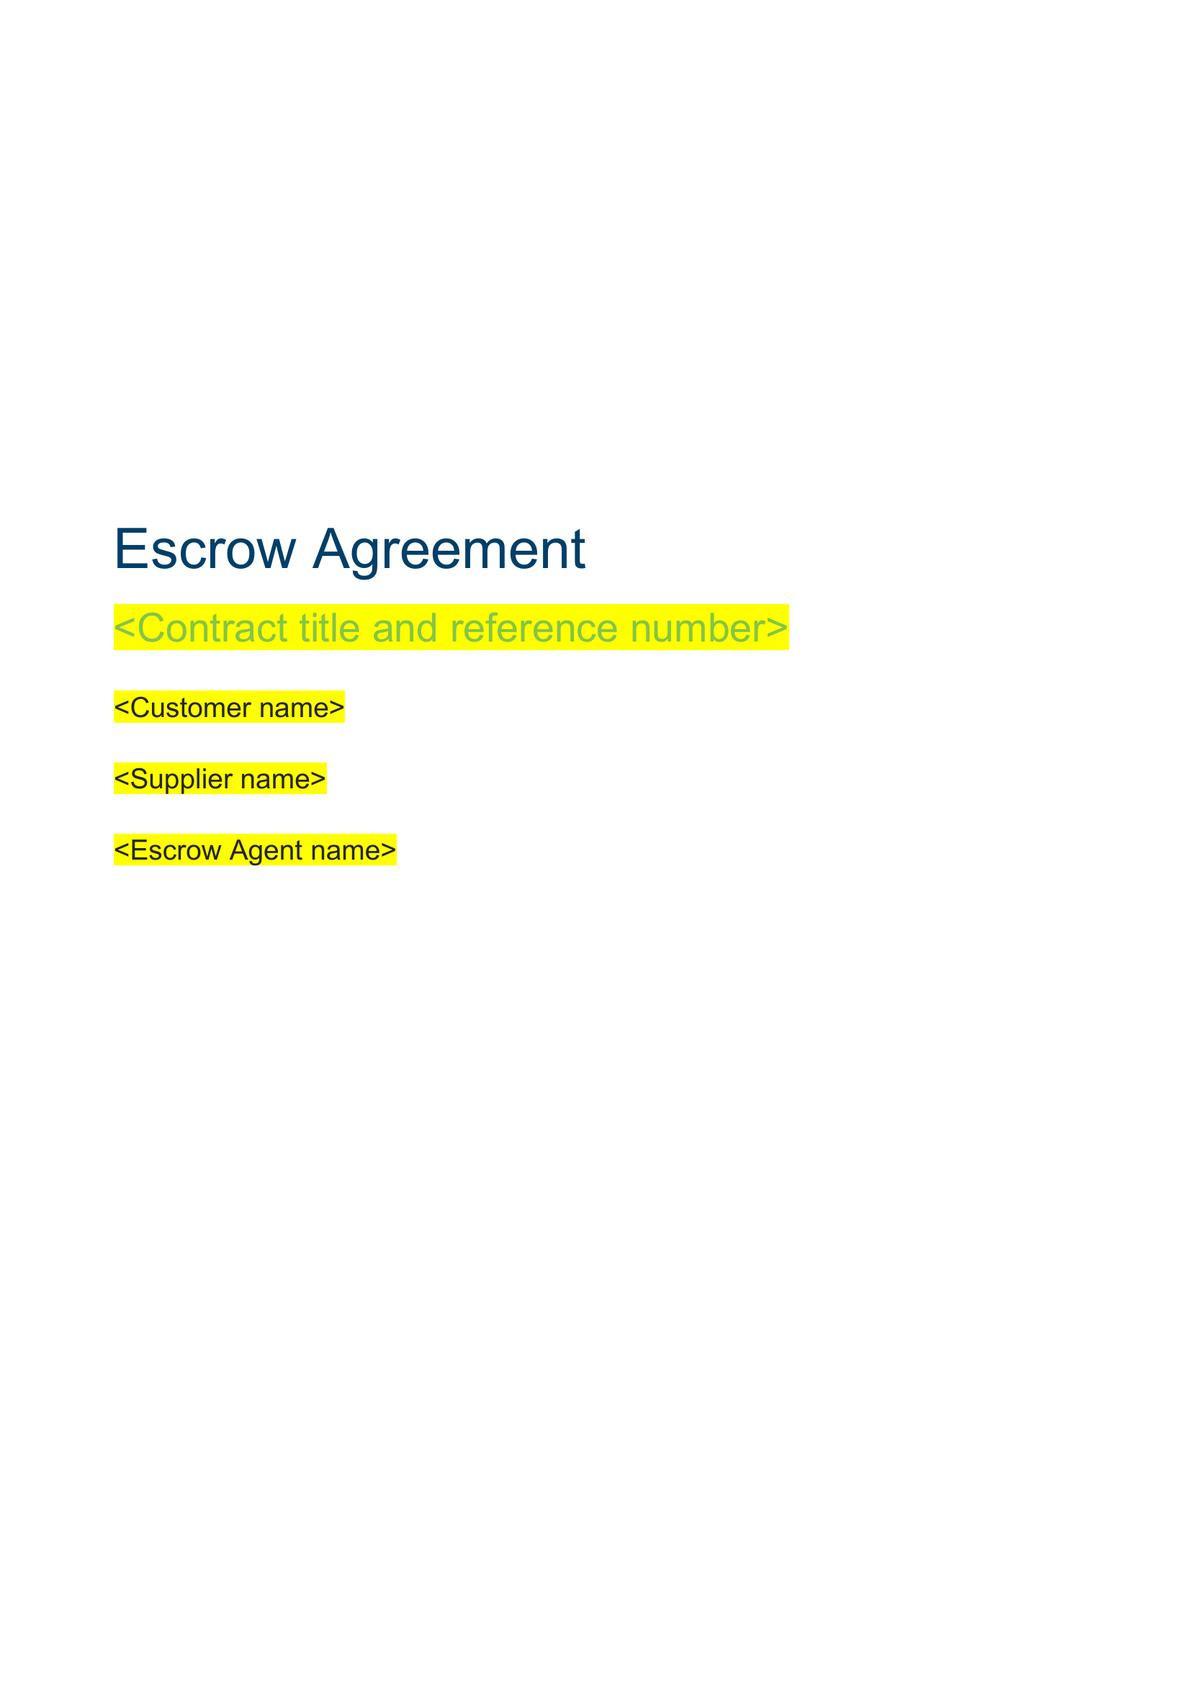 Escrow agreement-0